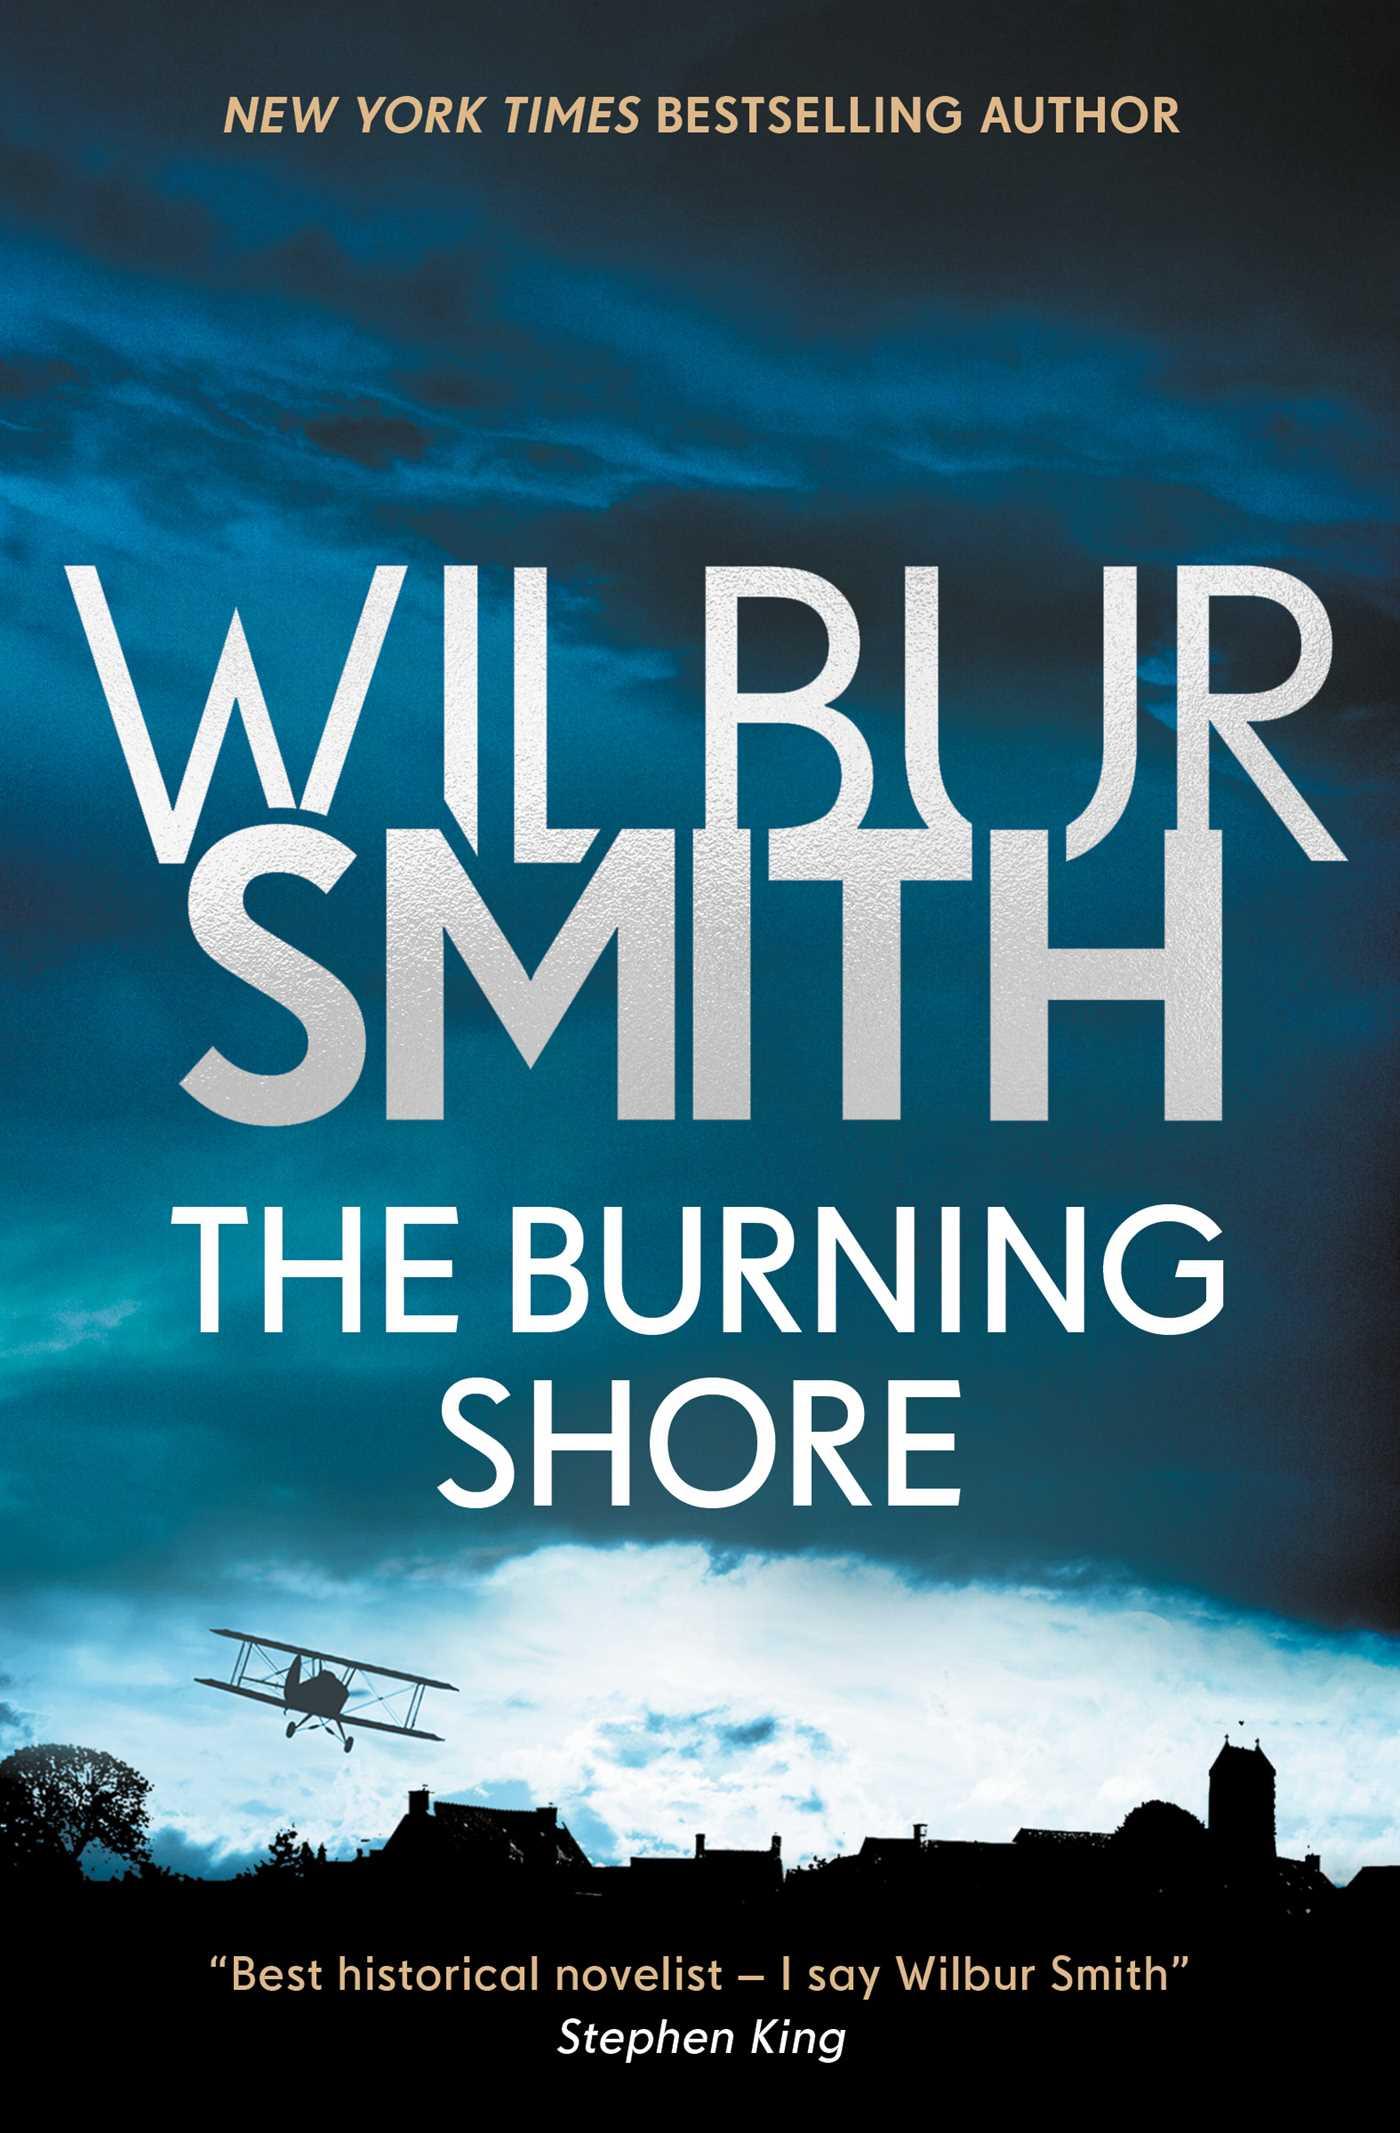 The burning shore 9781499860689 hr